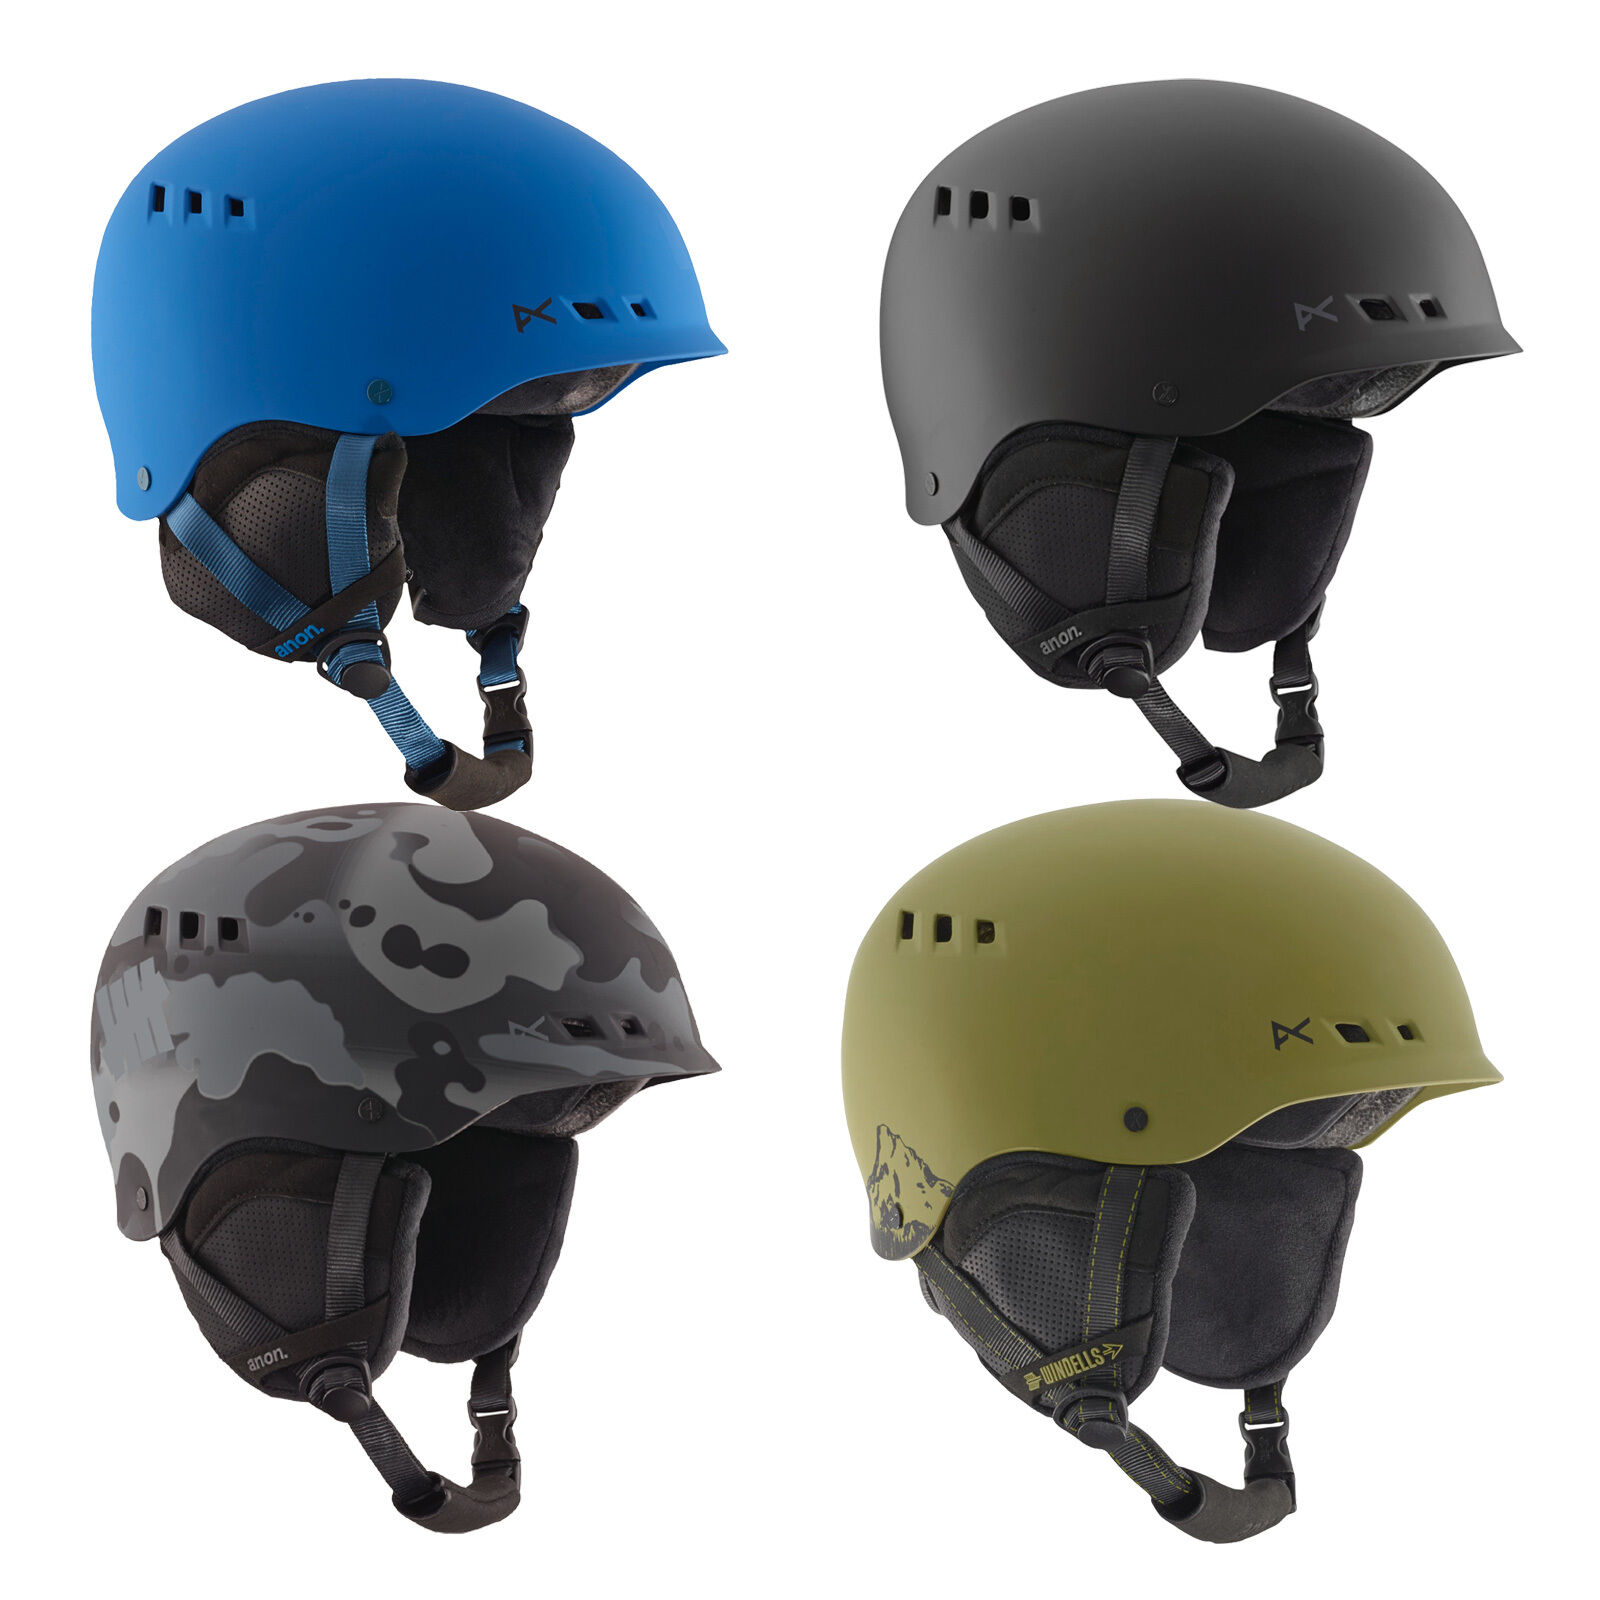 Anon Talan Wintersport Protektion Snowboard-Ski-Helm Snowboardhelm Skihelm